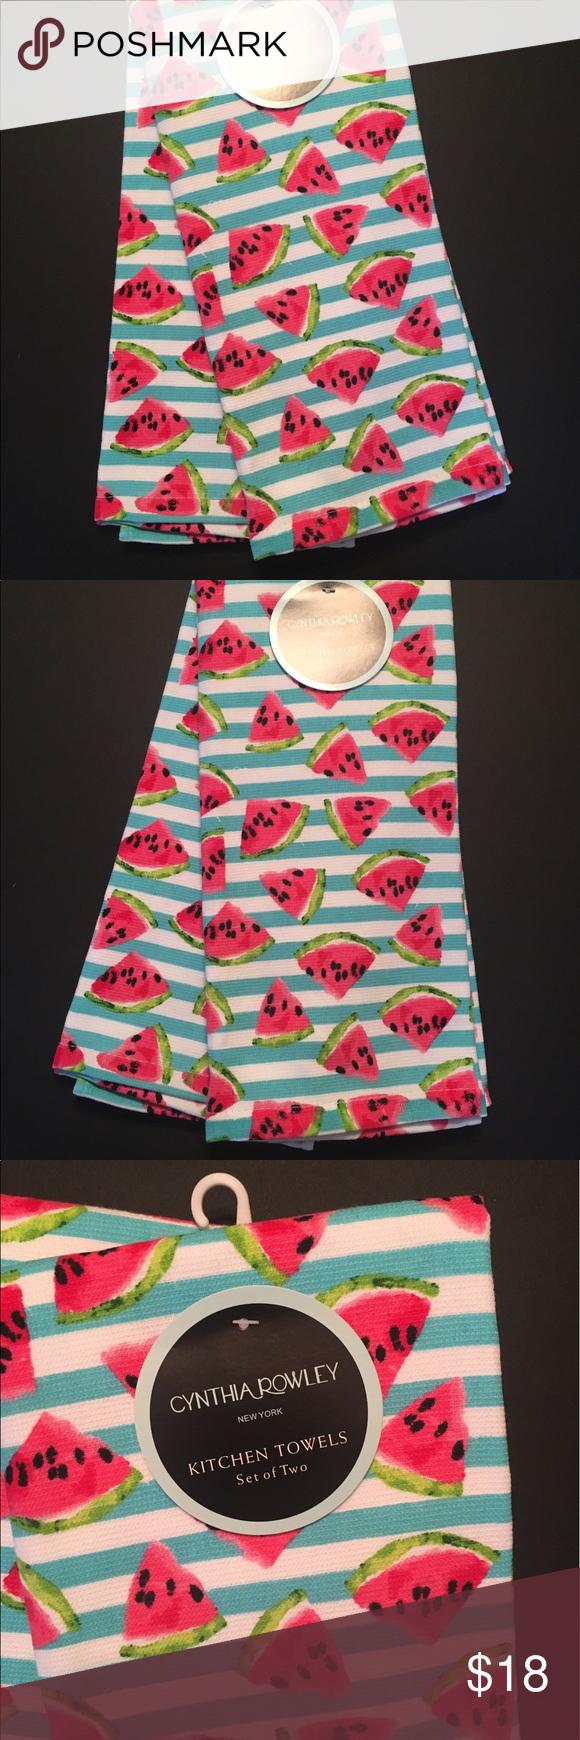 Cynthia Rowley Kitchen Towels Watermelon Stripe Cynthia Rowley Kitchen  Towels Set